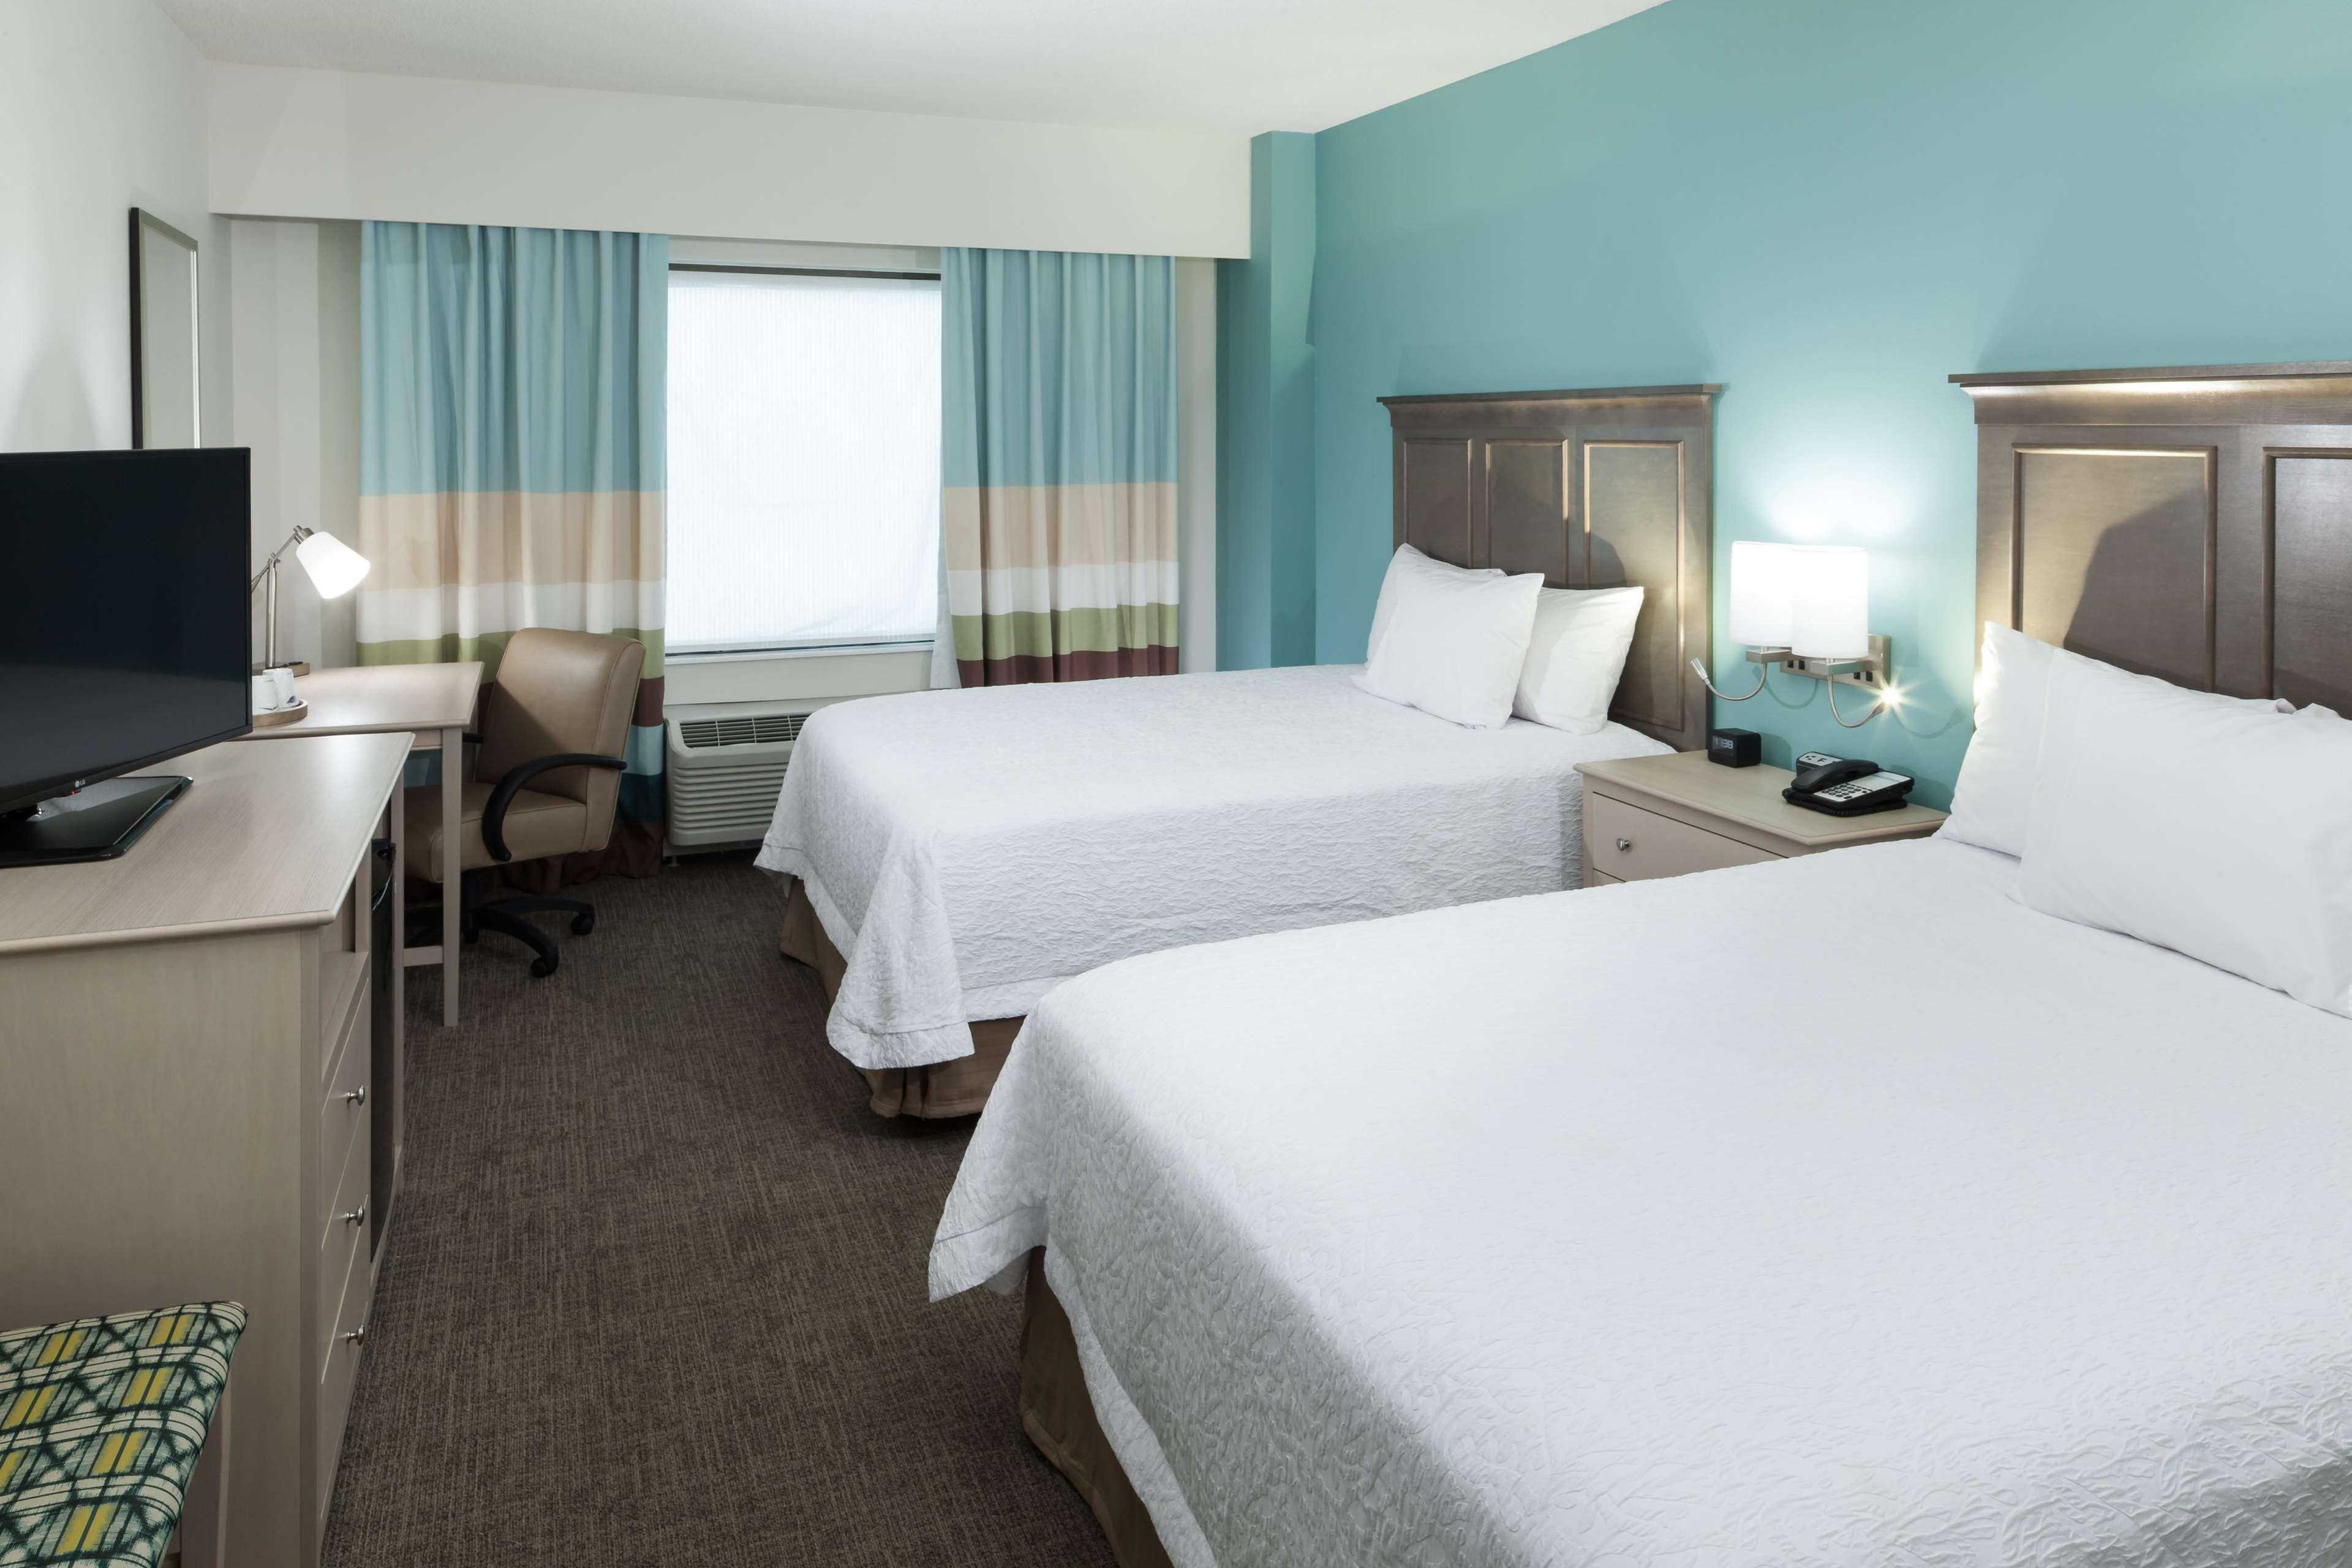 Hampton Inn & Suites Carolina Beach Oceanfront